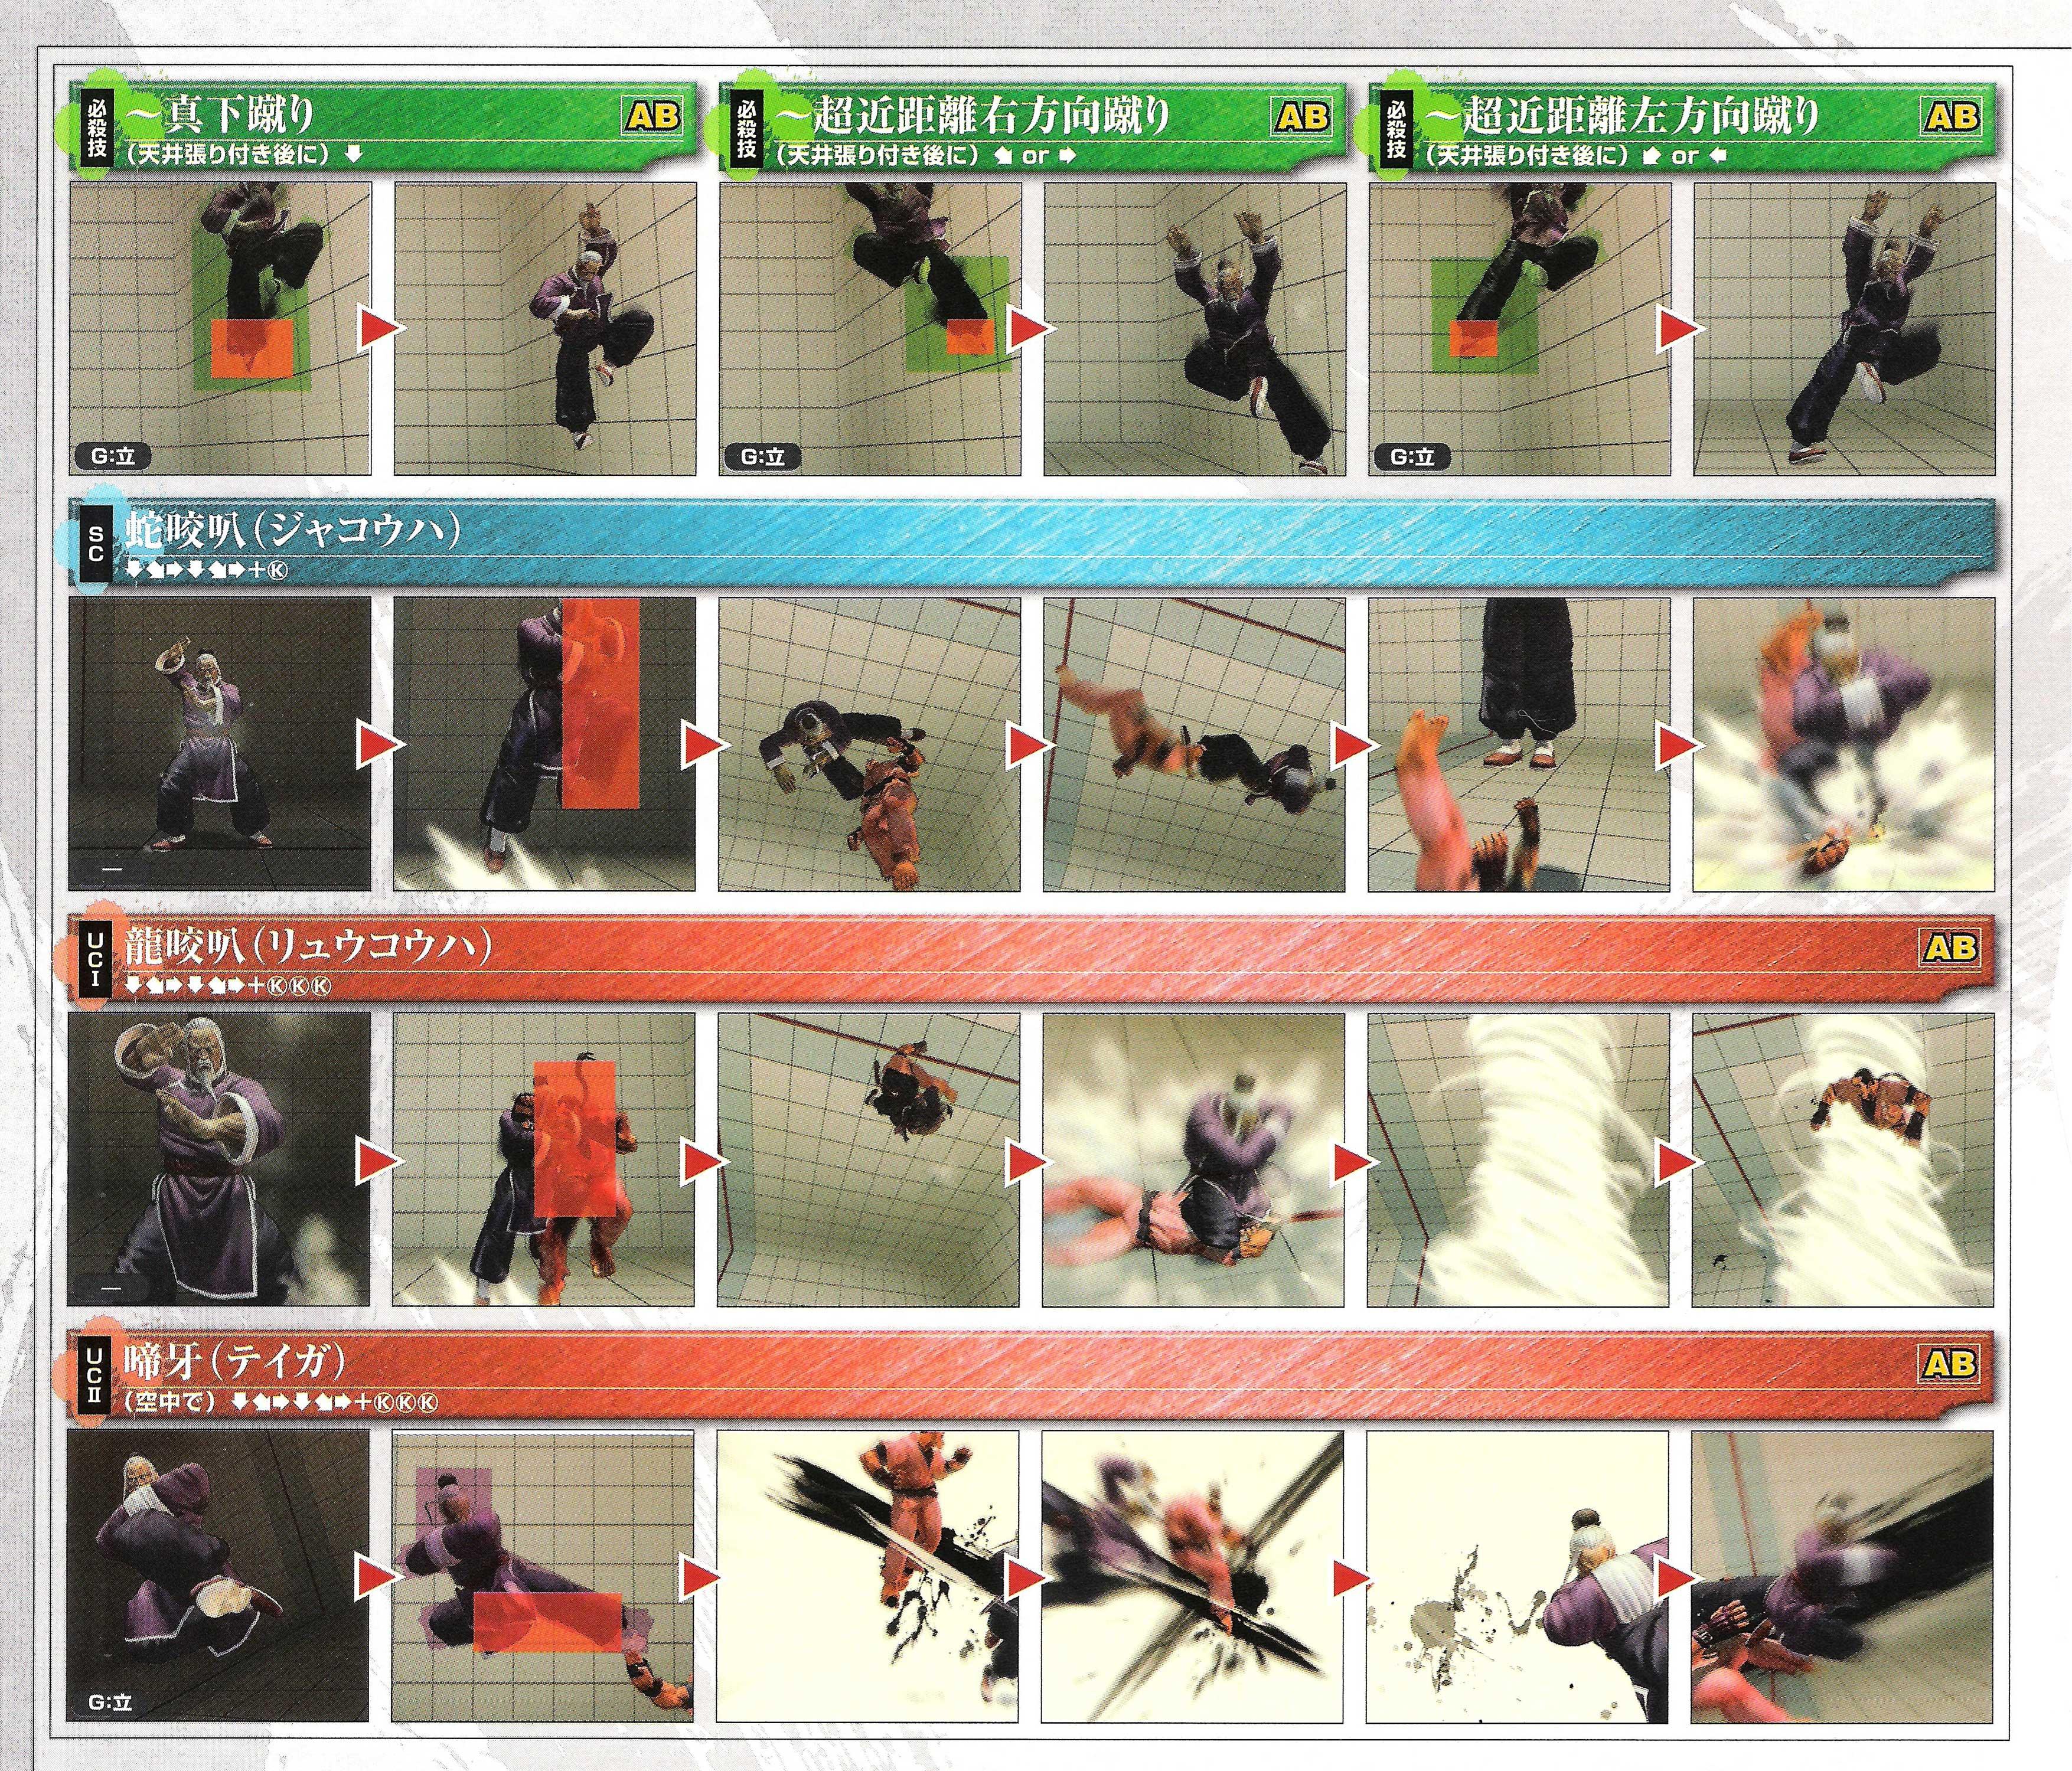 Gen's hit box information for Super Street Fighter 4 Arcade Edition image #3